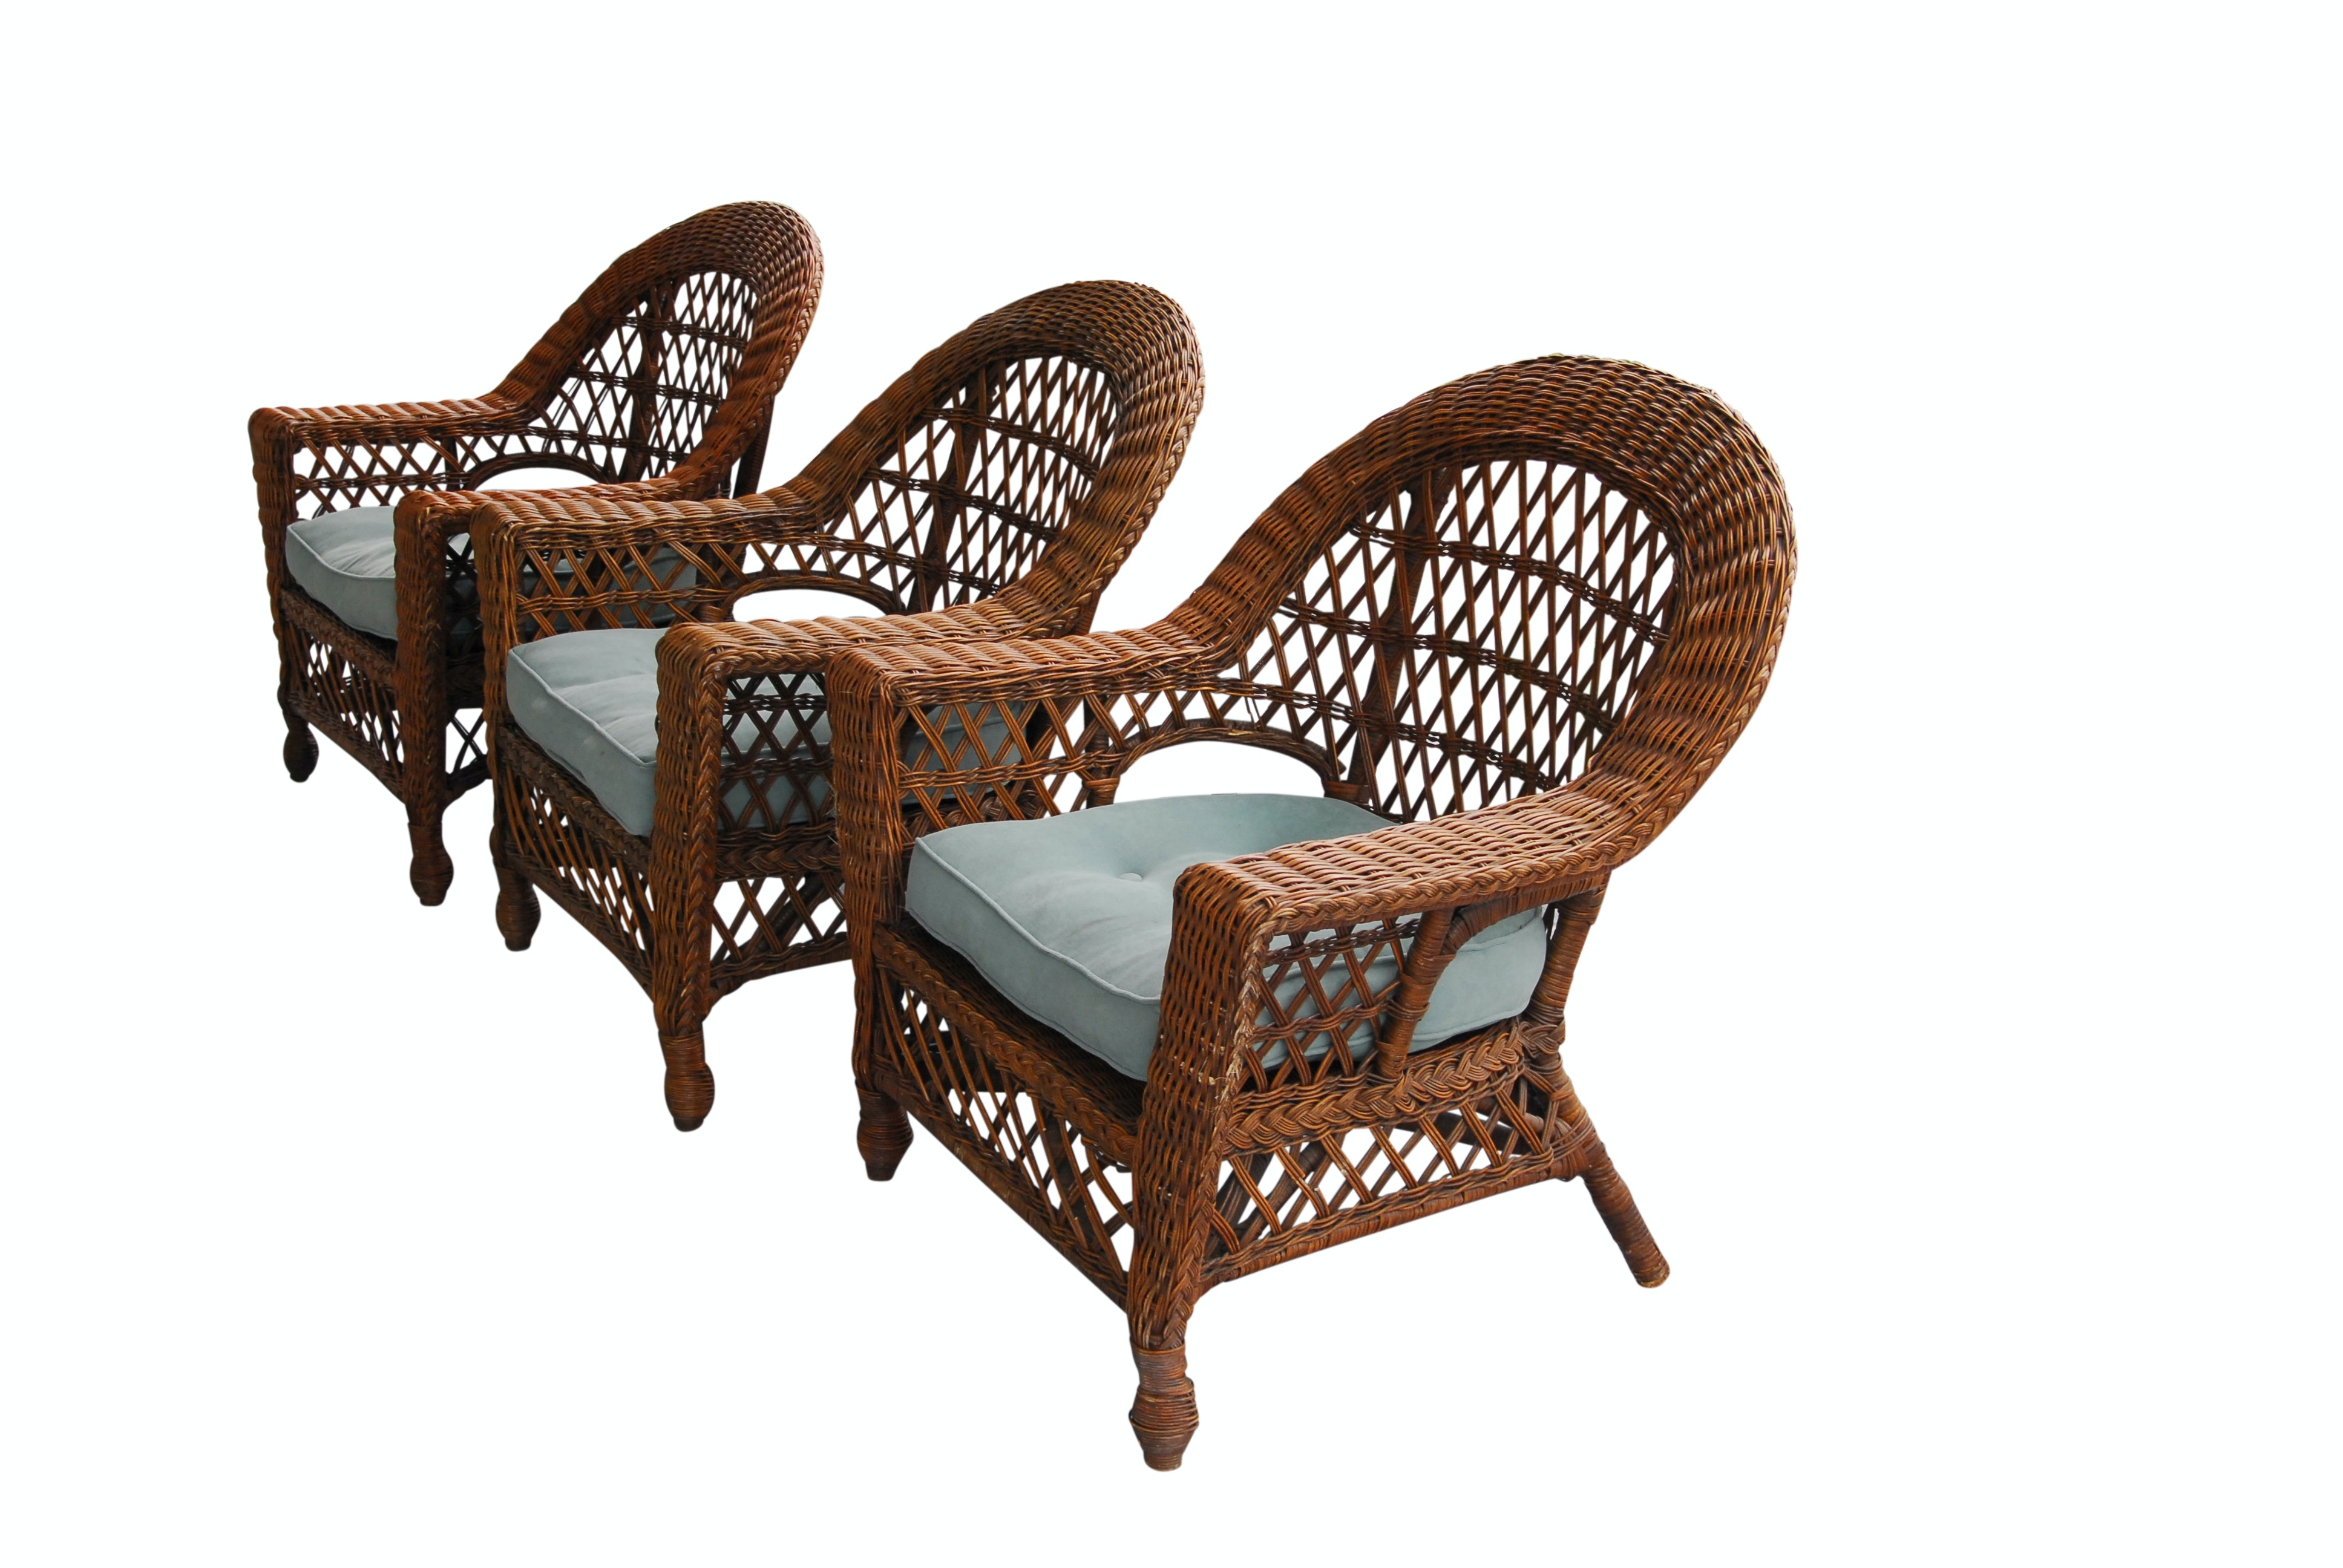 Three Wicker Armchairs